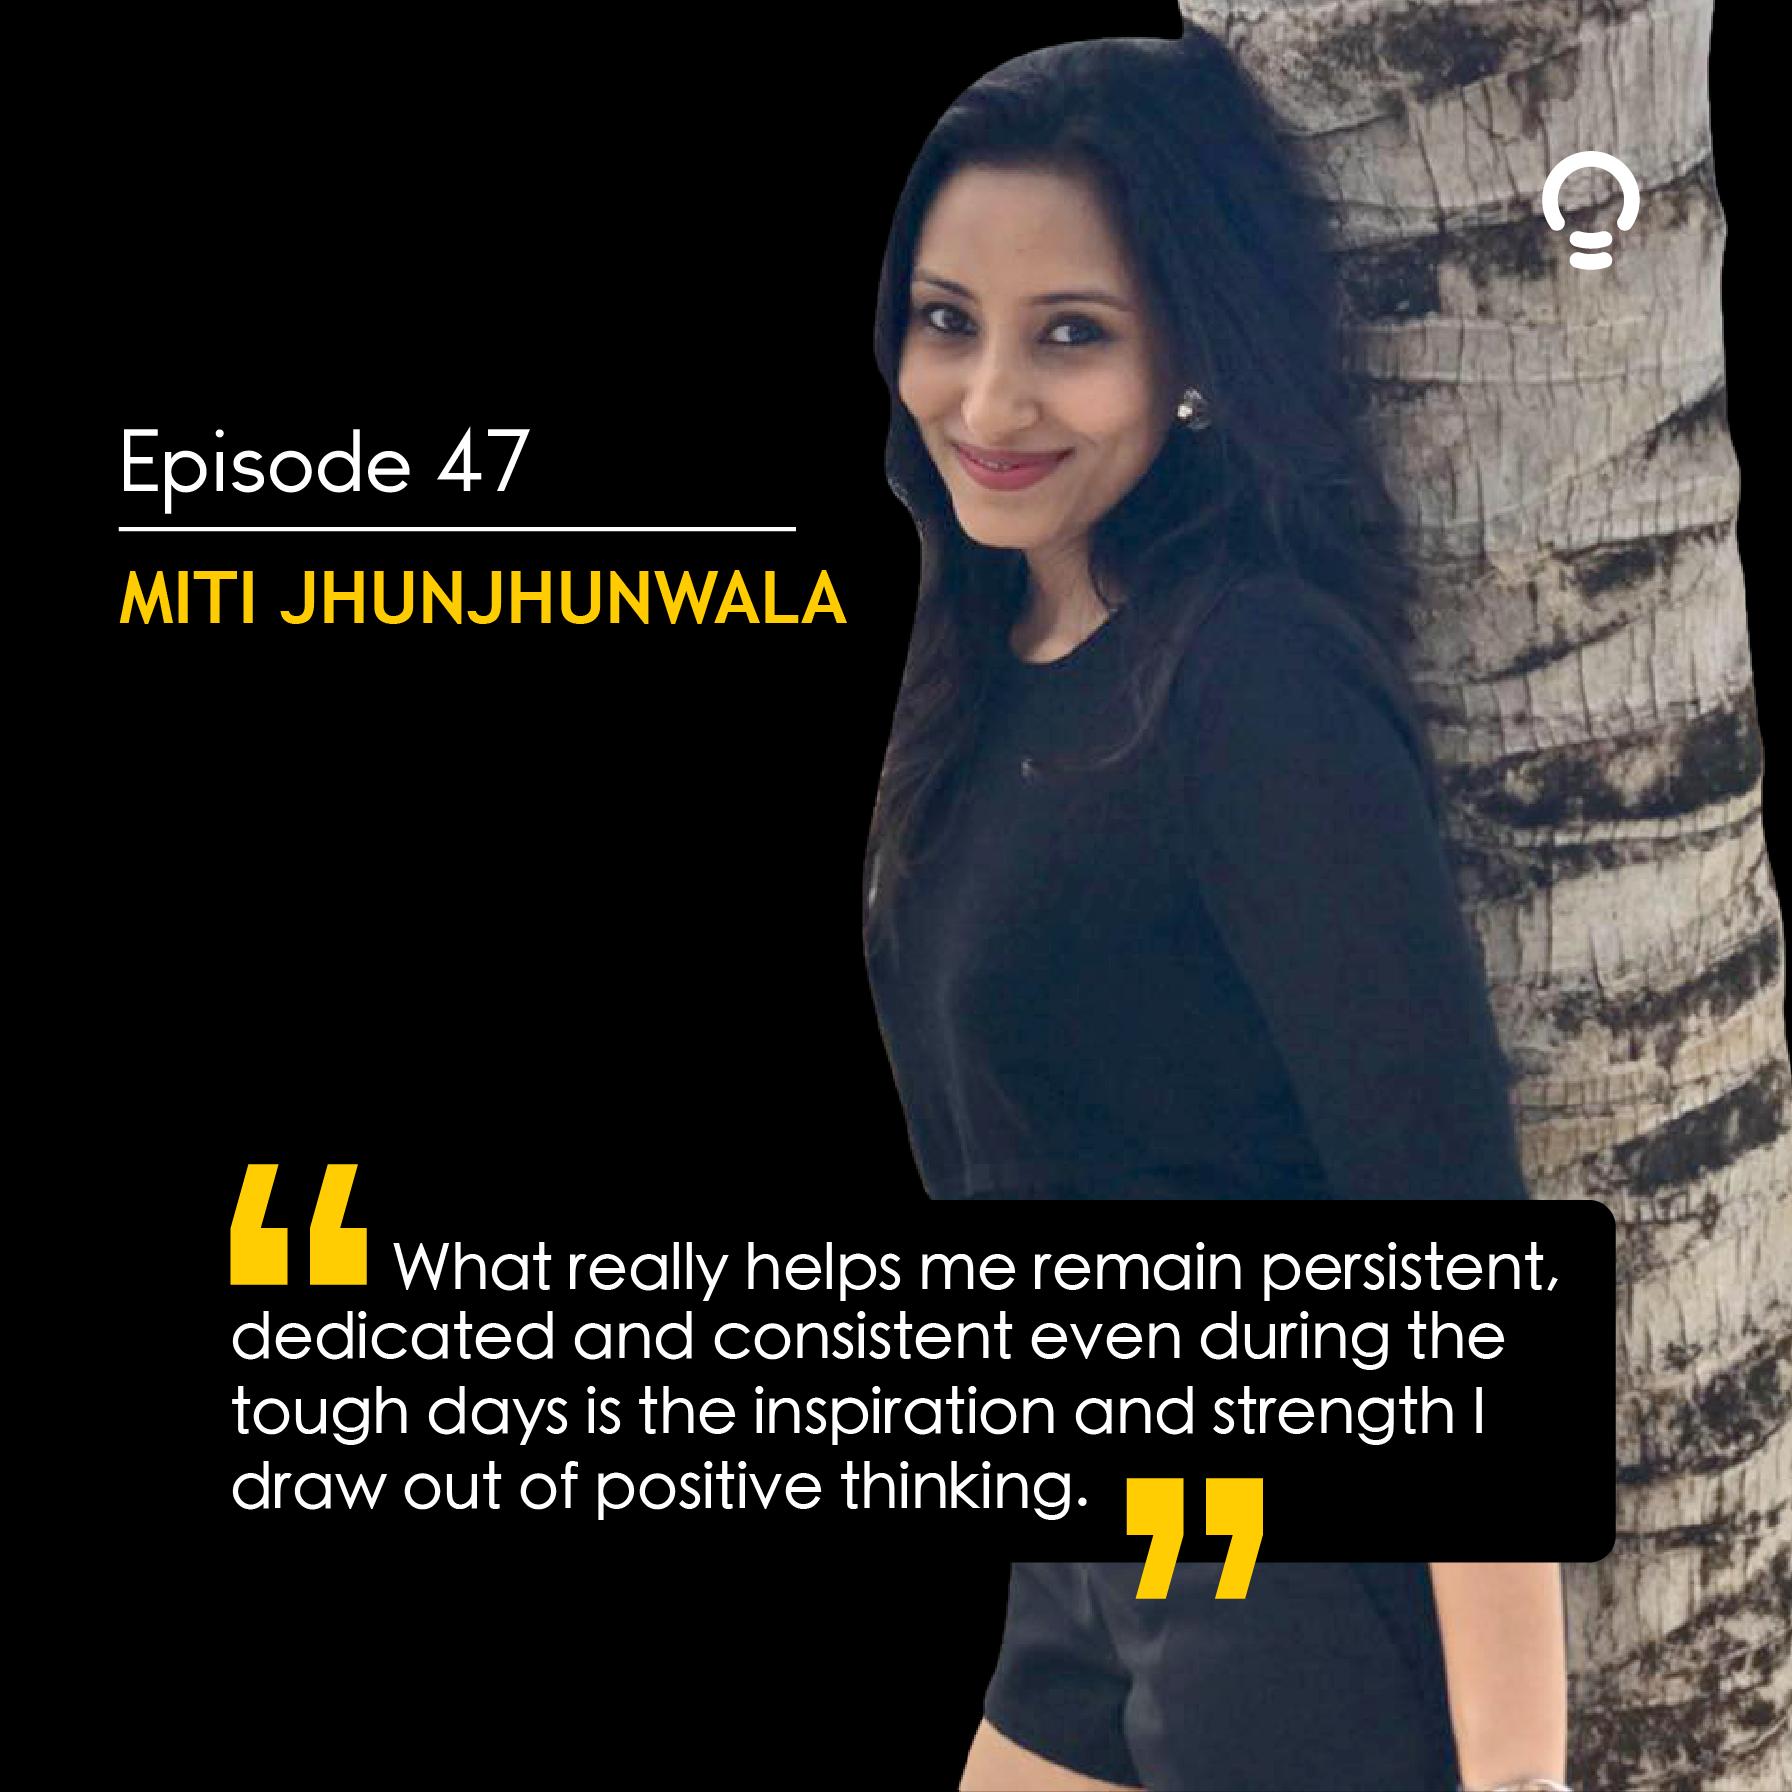 Miti - Inspiring entrepreneurs